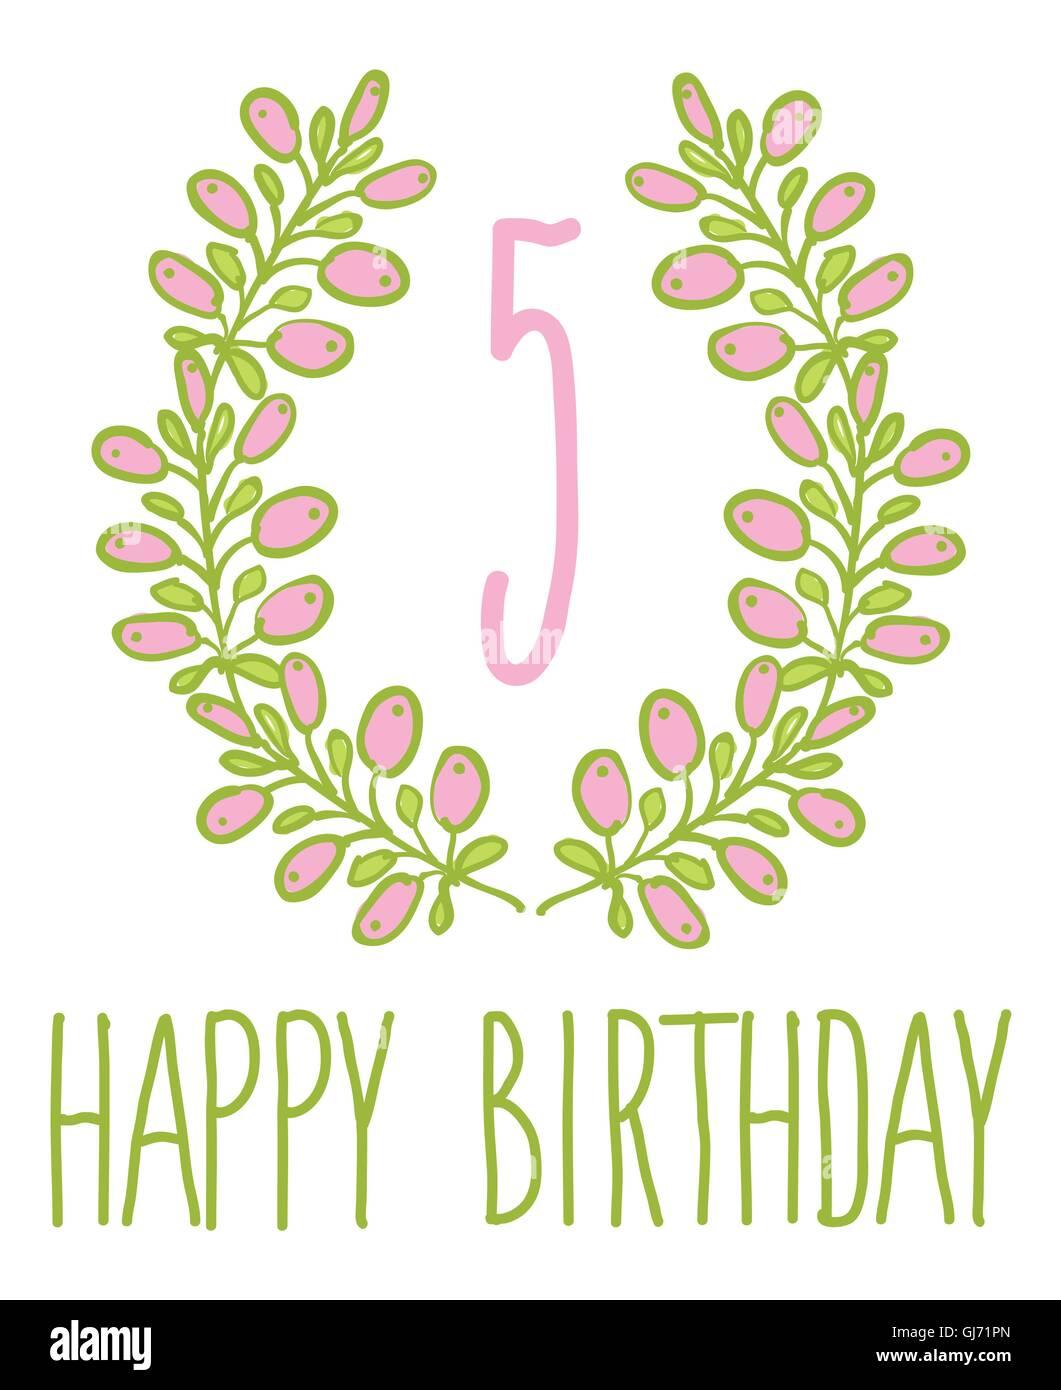 Happy birthday card invitation with Set - Stock Vector